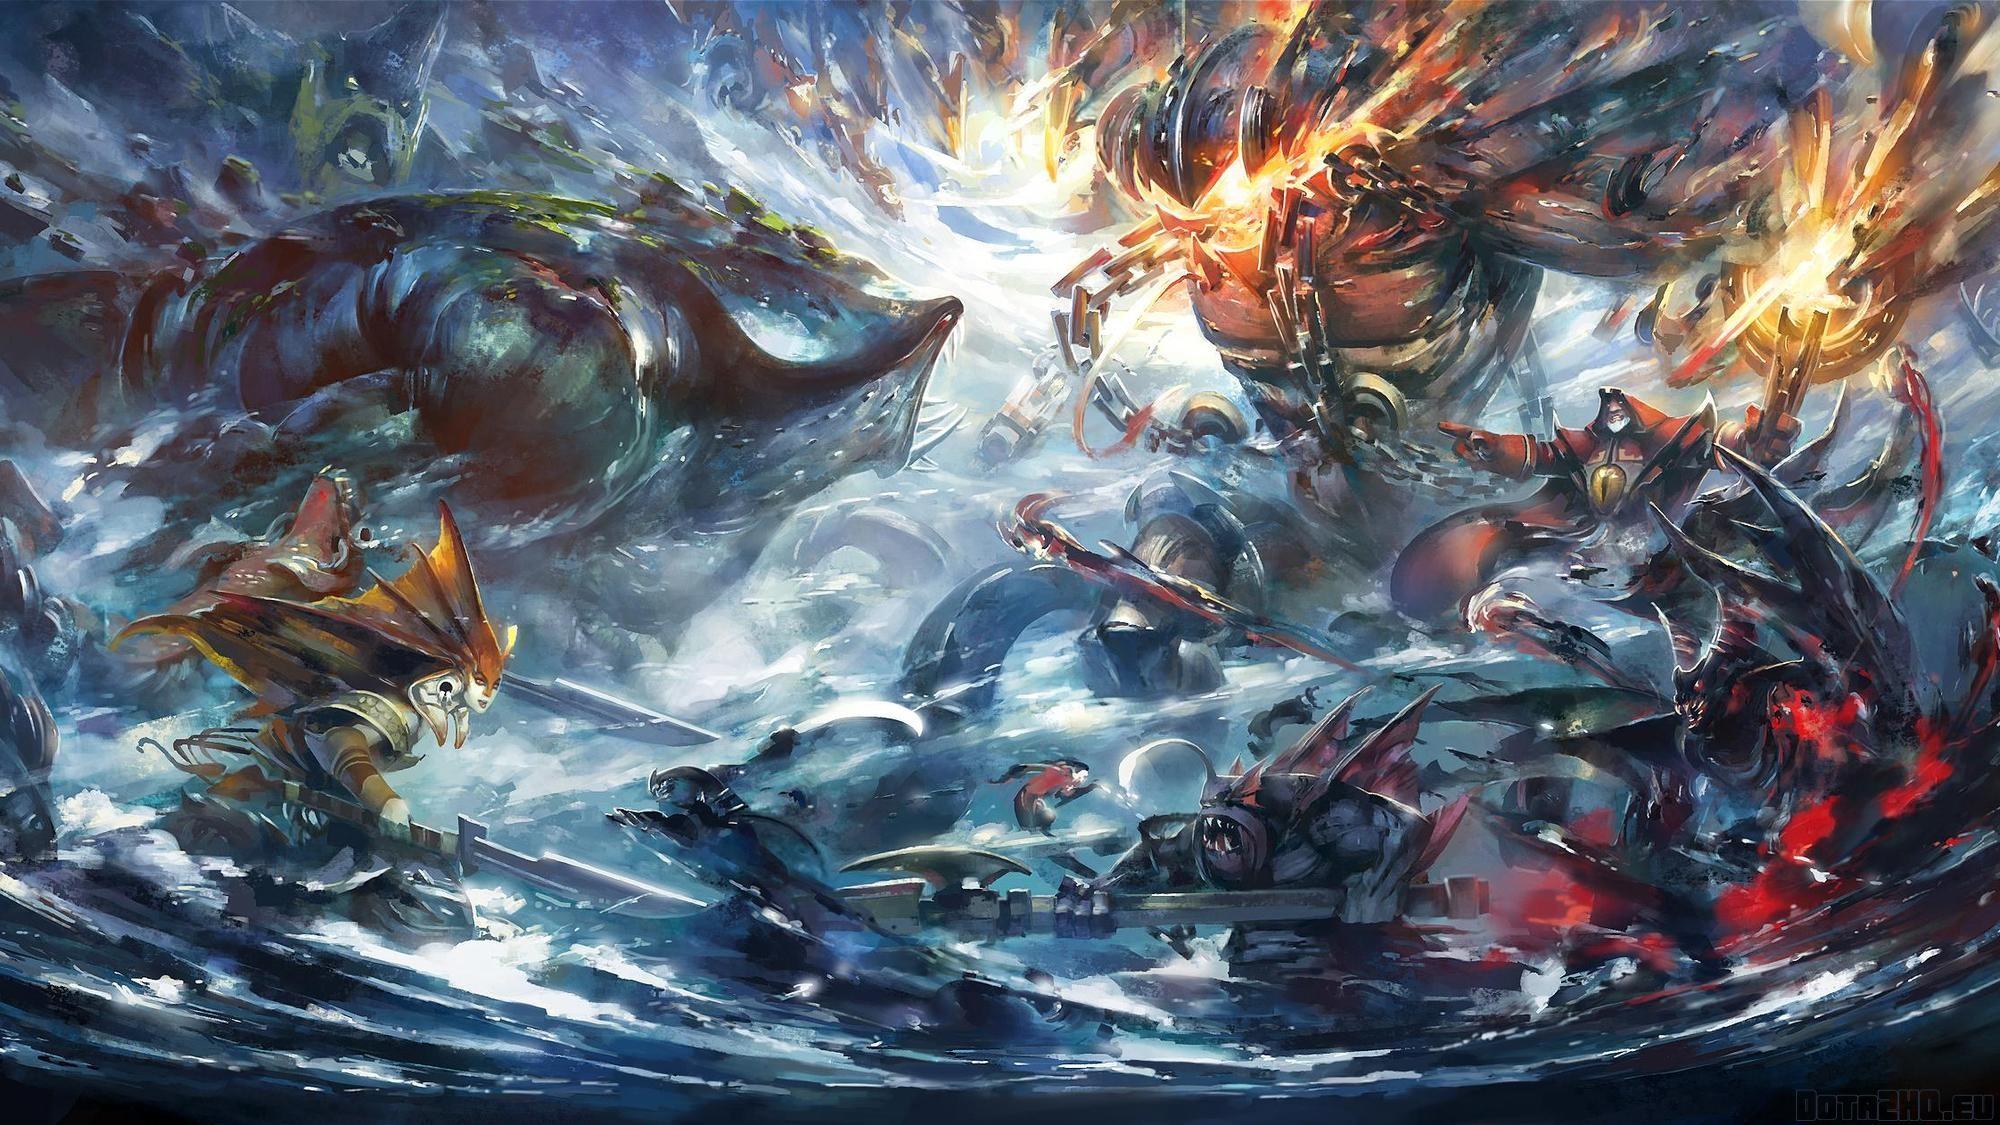 Res: 2000x1125, dota 2, epic battle, art